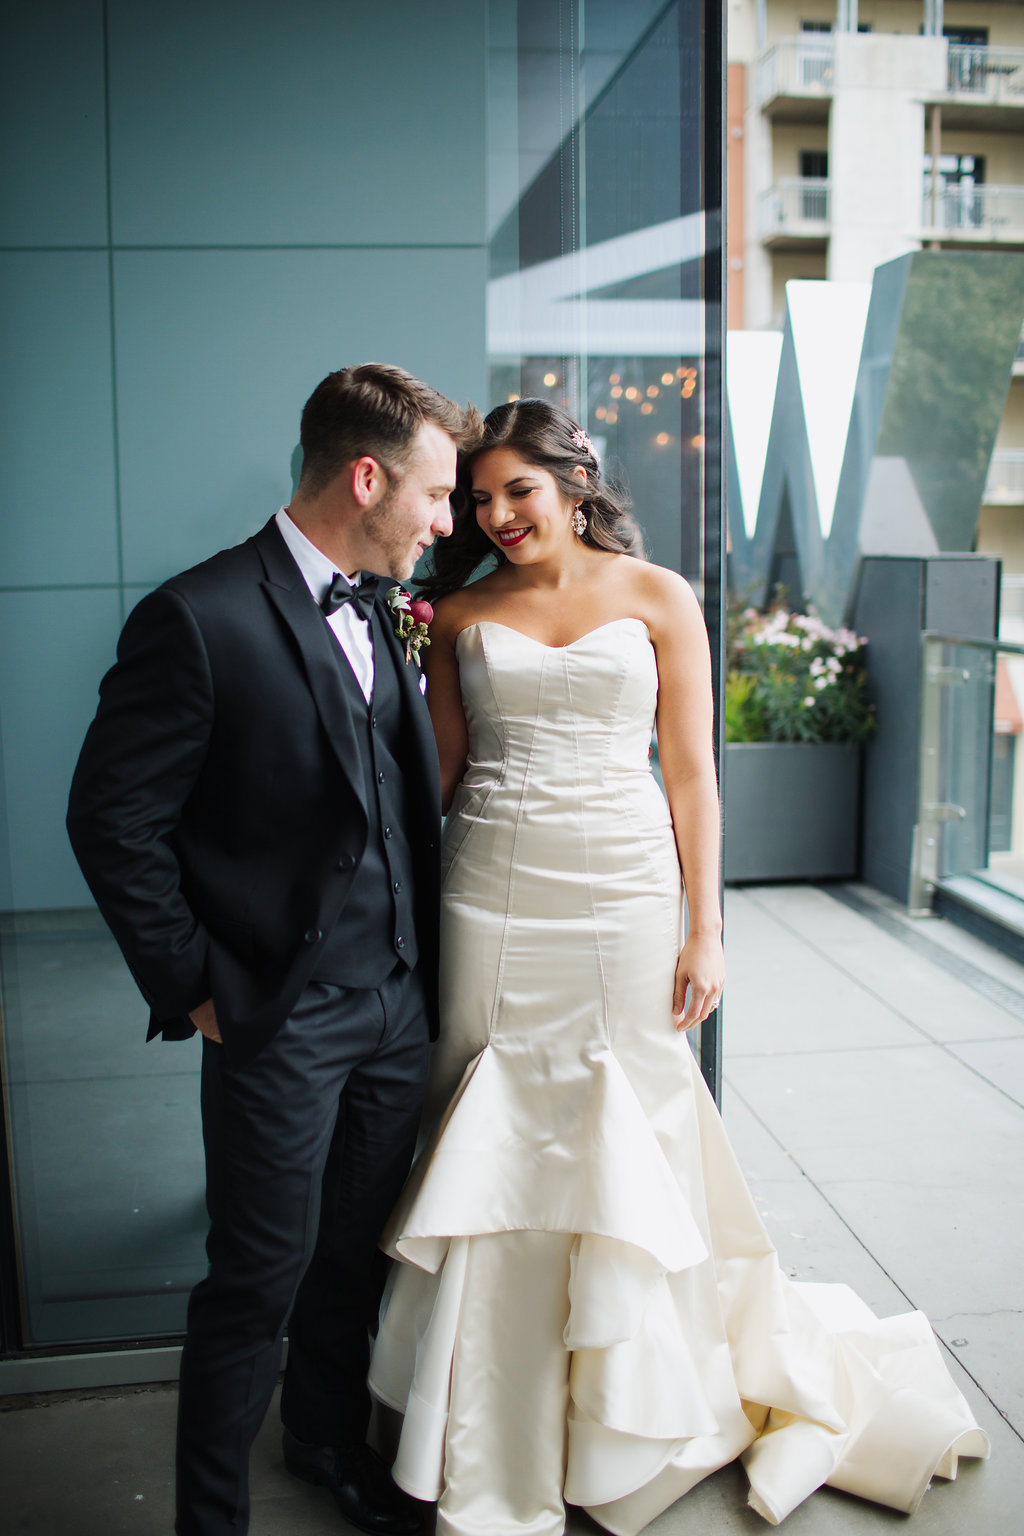 Paige-Newton-Photography-W-Hotel-Wedding-Austin-Photographer0018.jpg